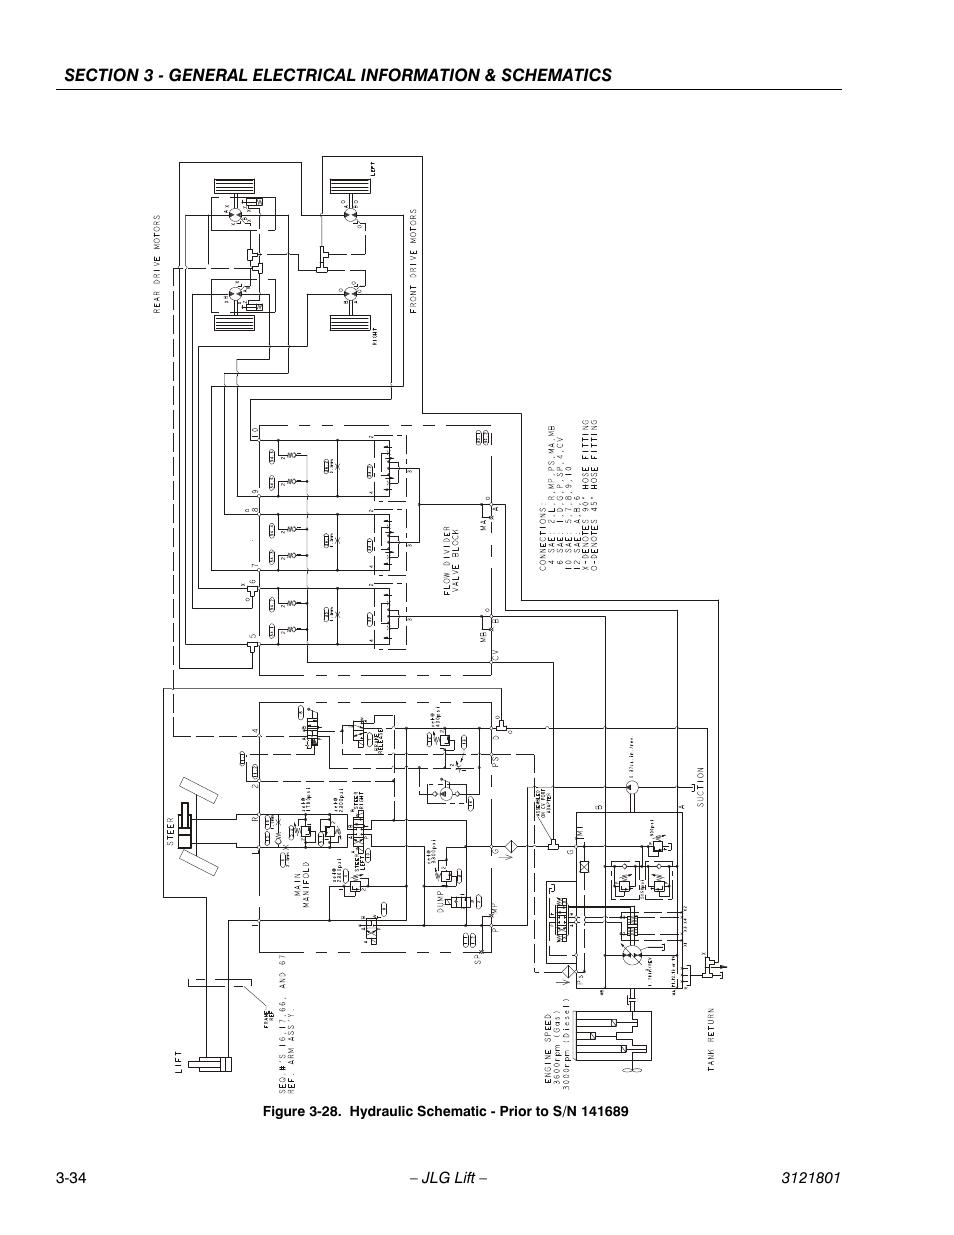 medium resolution of hydraulic schematic prior to s n 141689 34 jlg 260mrt service manual